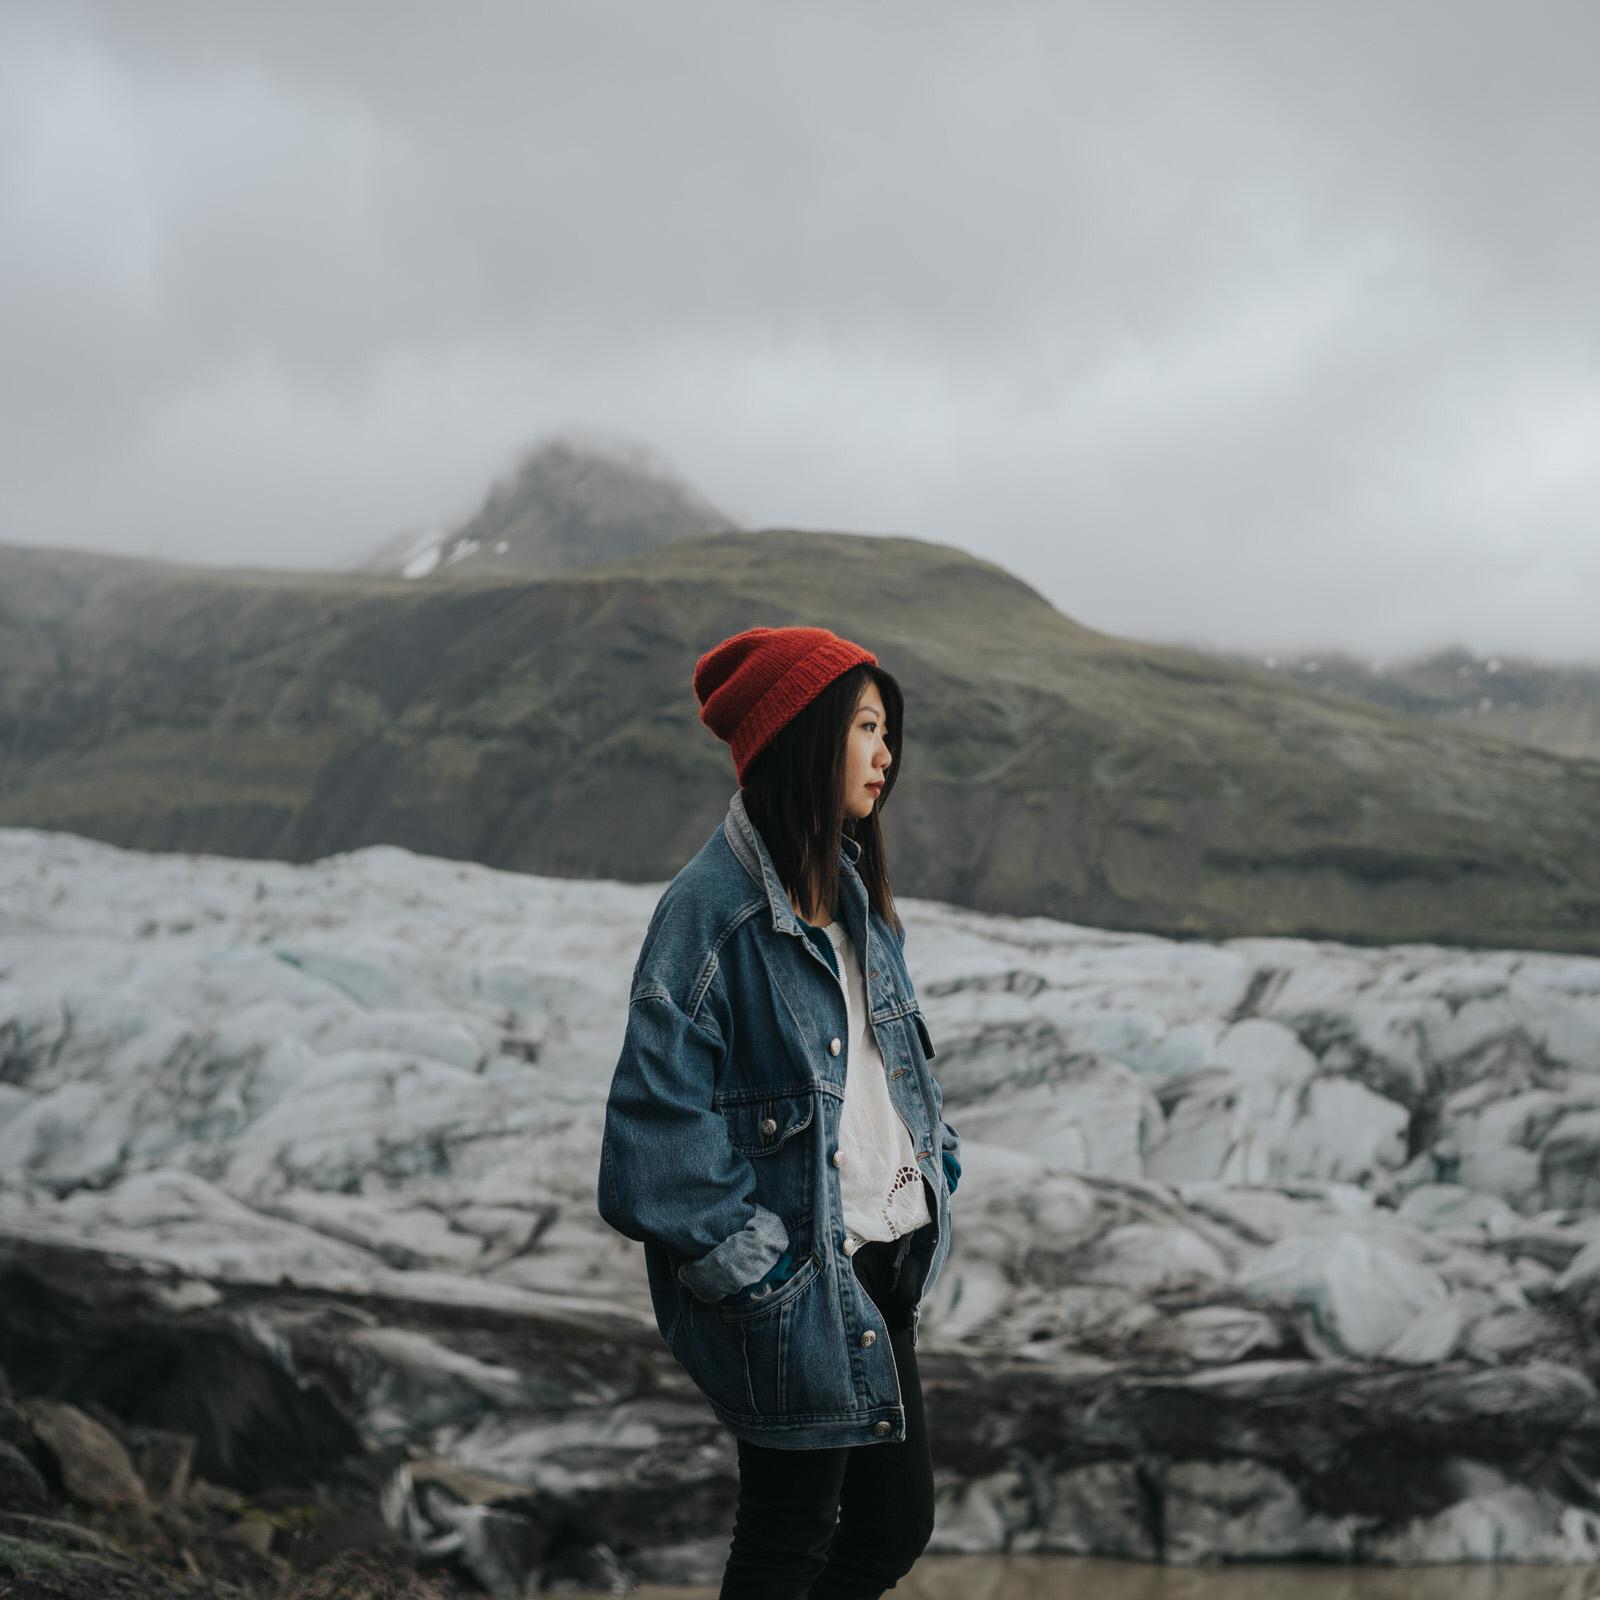 Glacier portrait of TJ Lee by Jaclyn Le